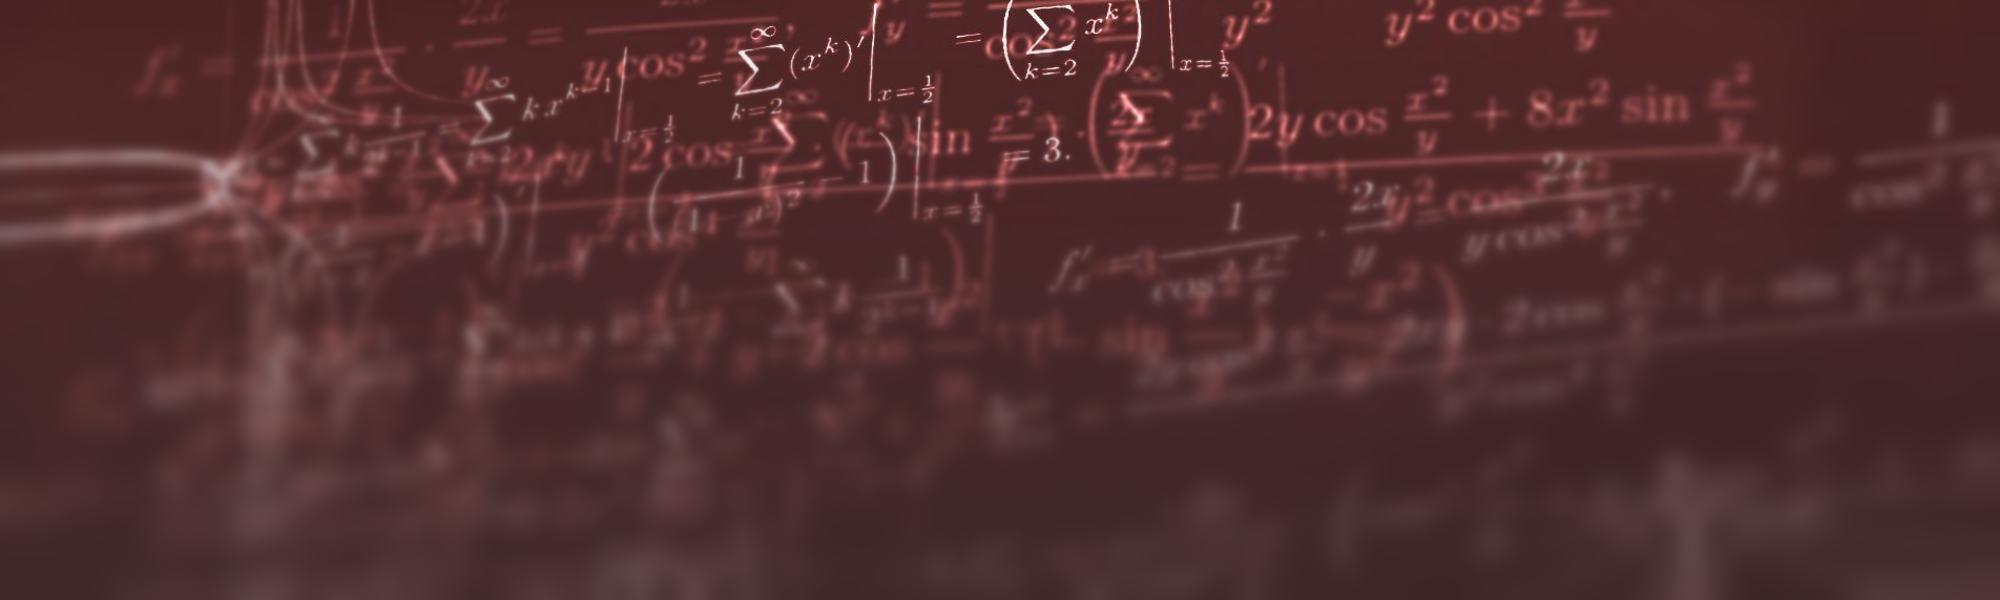 home slide mathematics